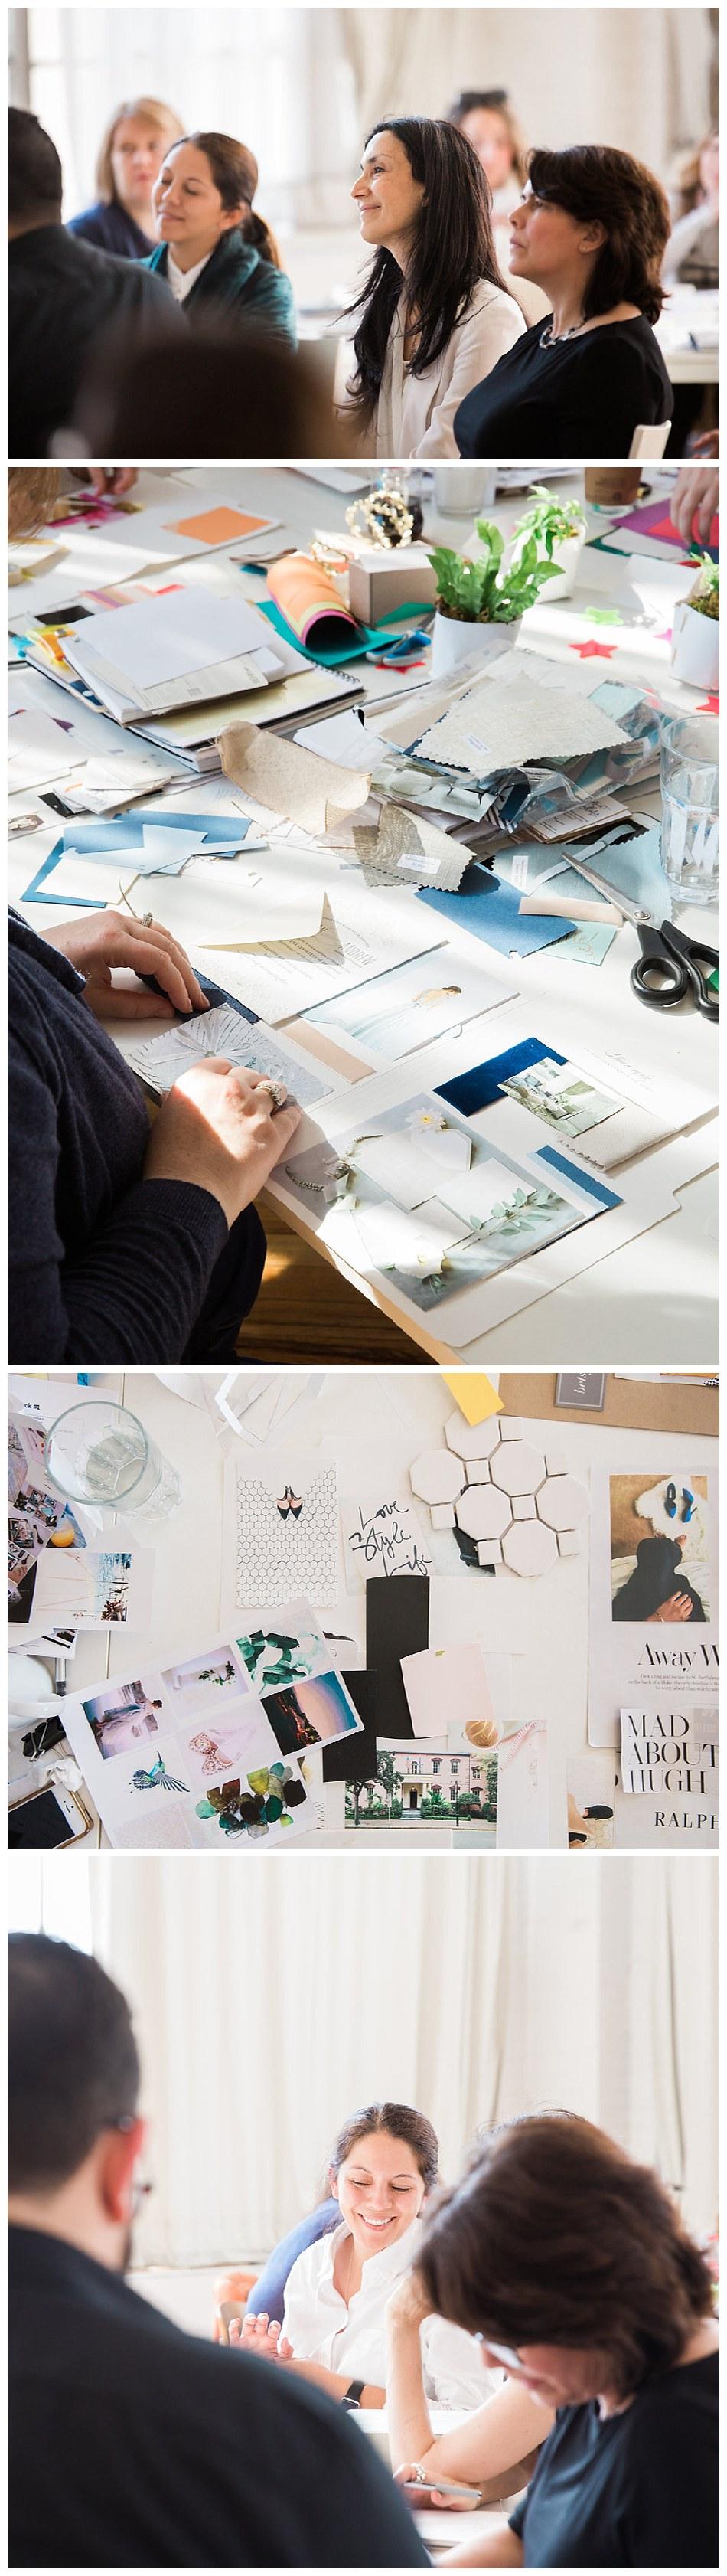 The Brand Stylist Colour Psychology Workshop New York Fiona Humberstone_0064